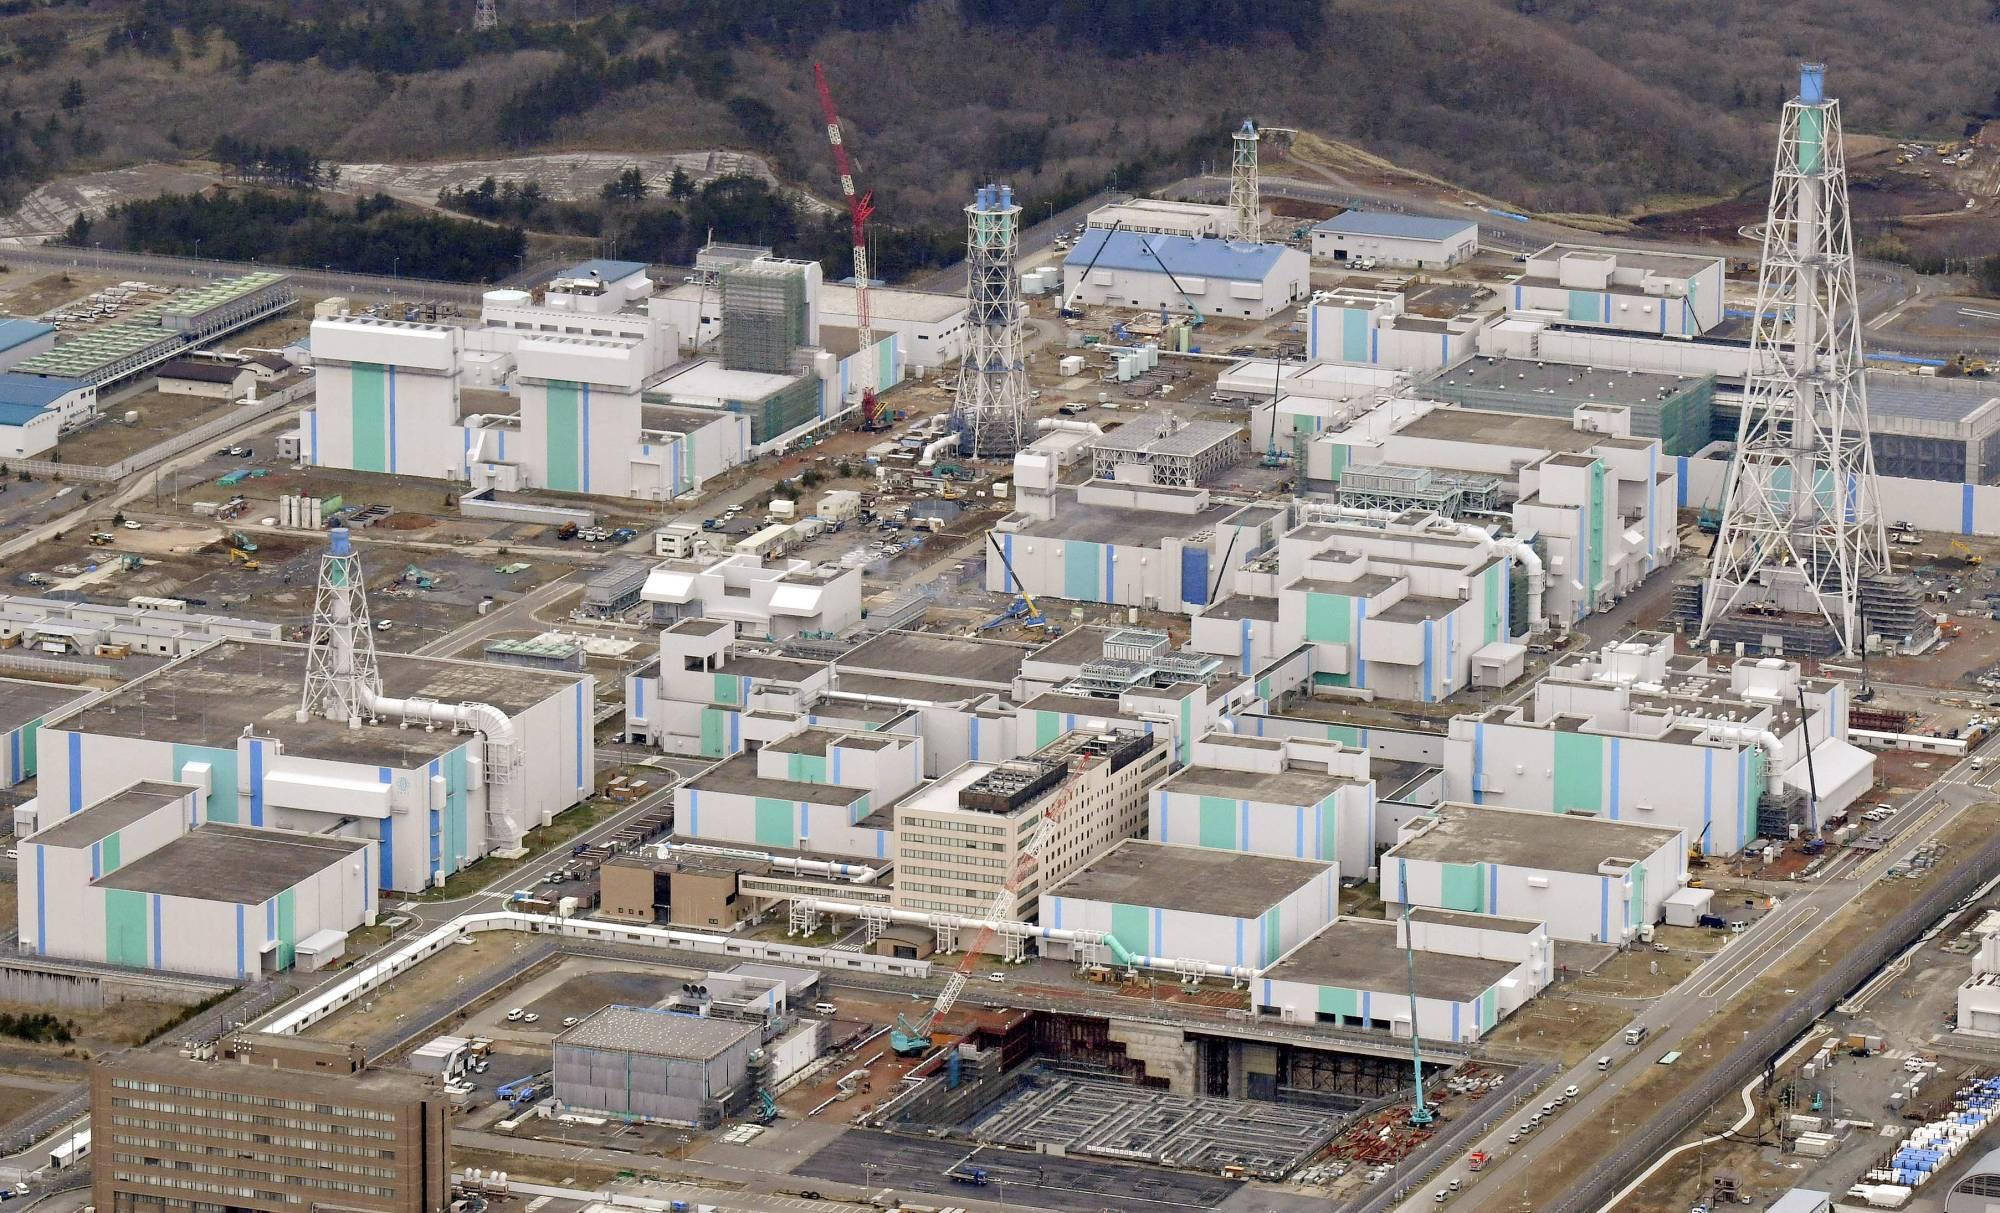 Aomori's Rokkasho nuclear plant — на разделительном заводе RUEP в Рокасё